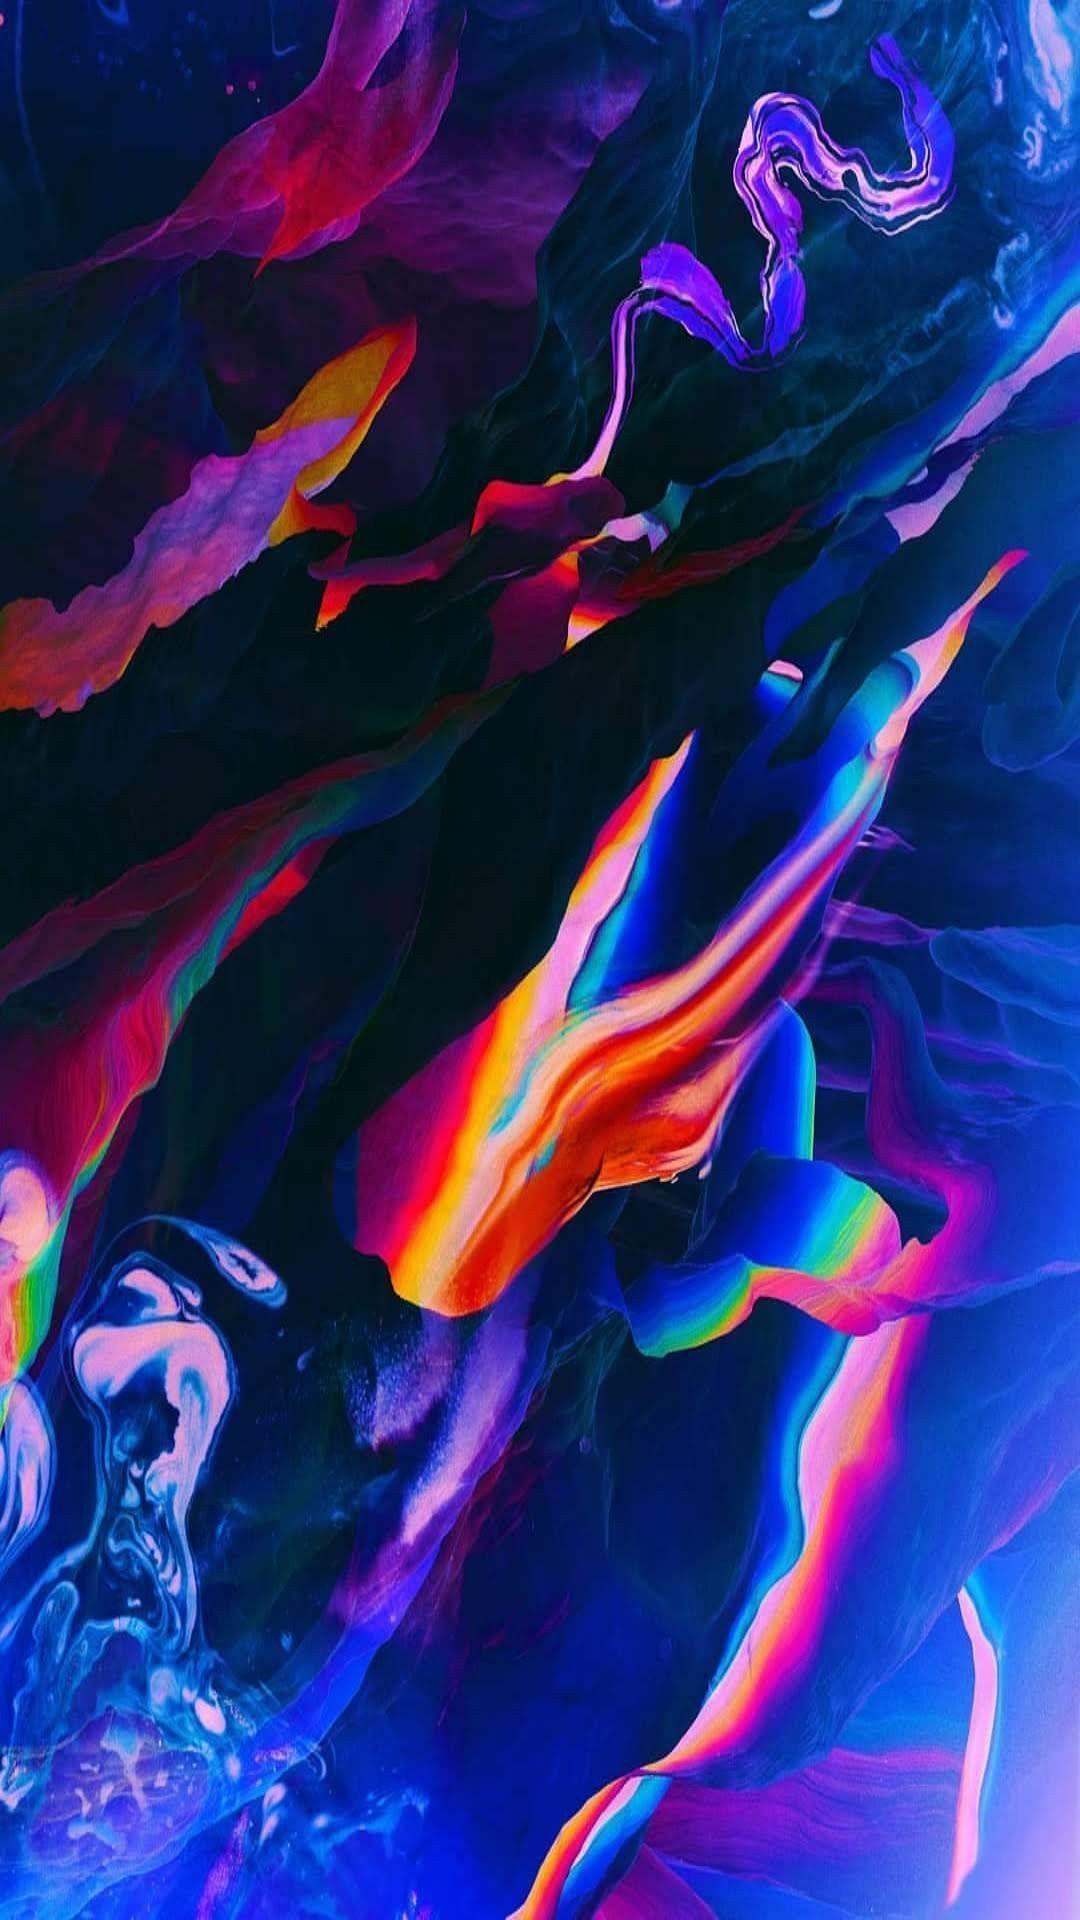 Fluid Amoled Wallpapers   Top Fluid Amoled Backgrounds 1080x1920